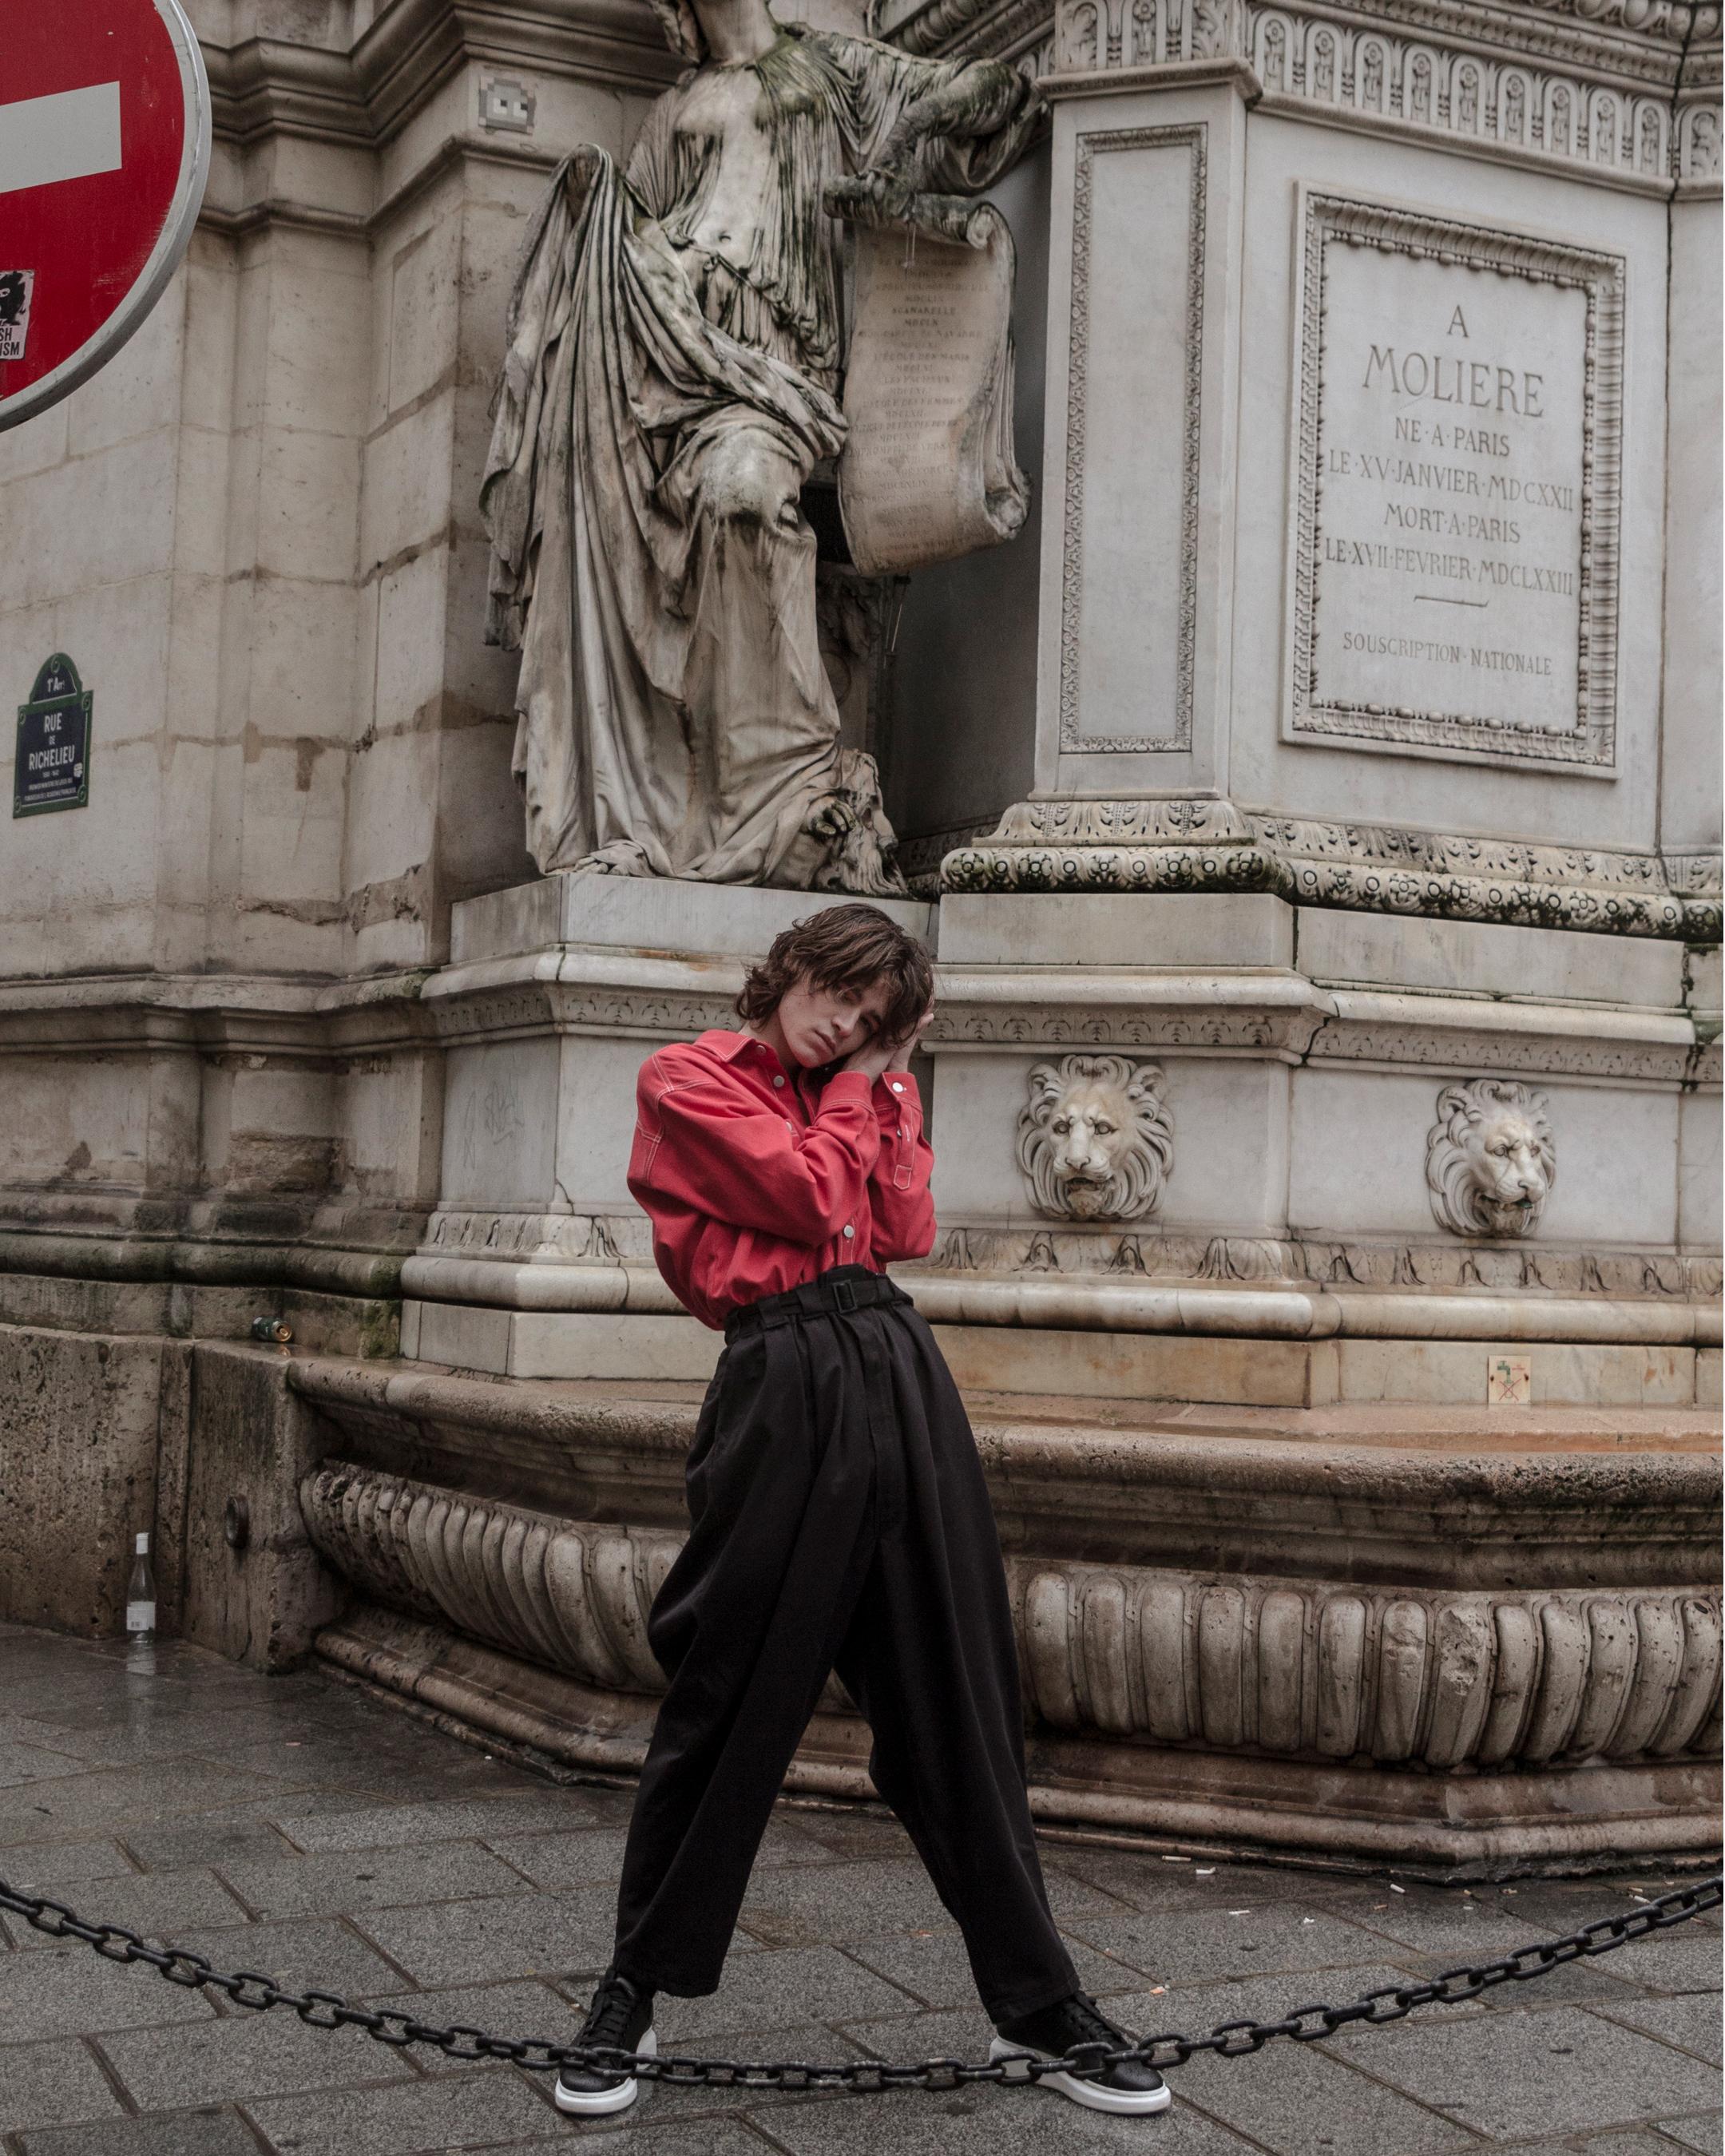 OWOI_MensFashionPost_SimonSchmidt_Paris_2018_Slide3_07.jpg